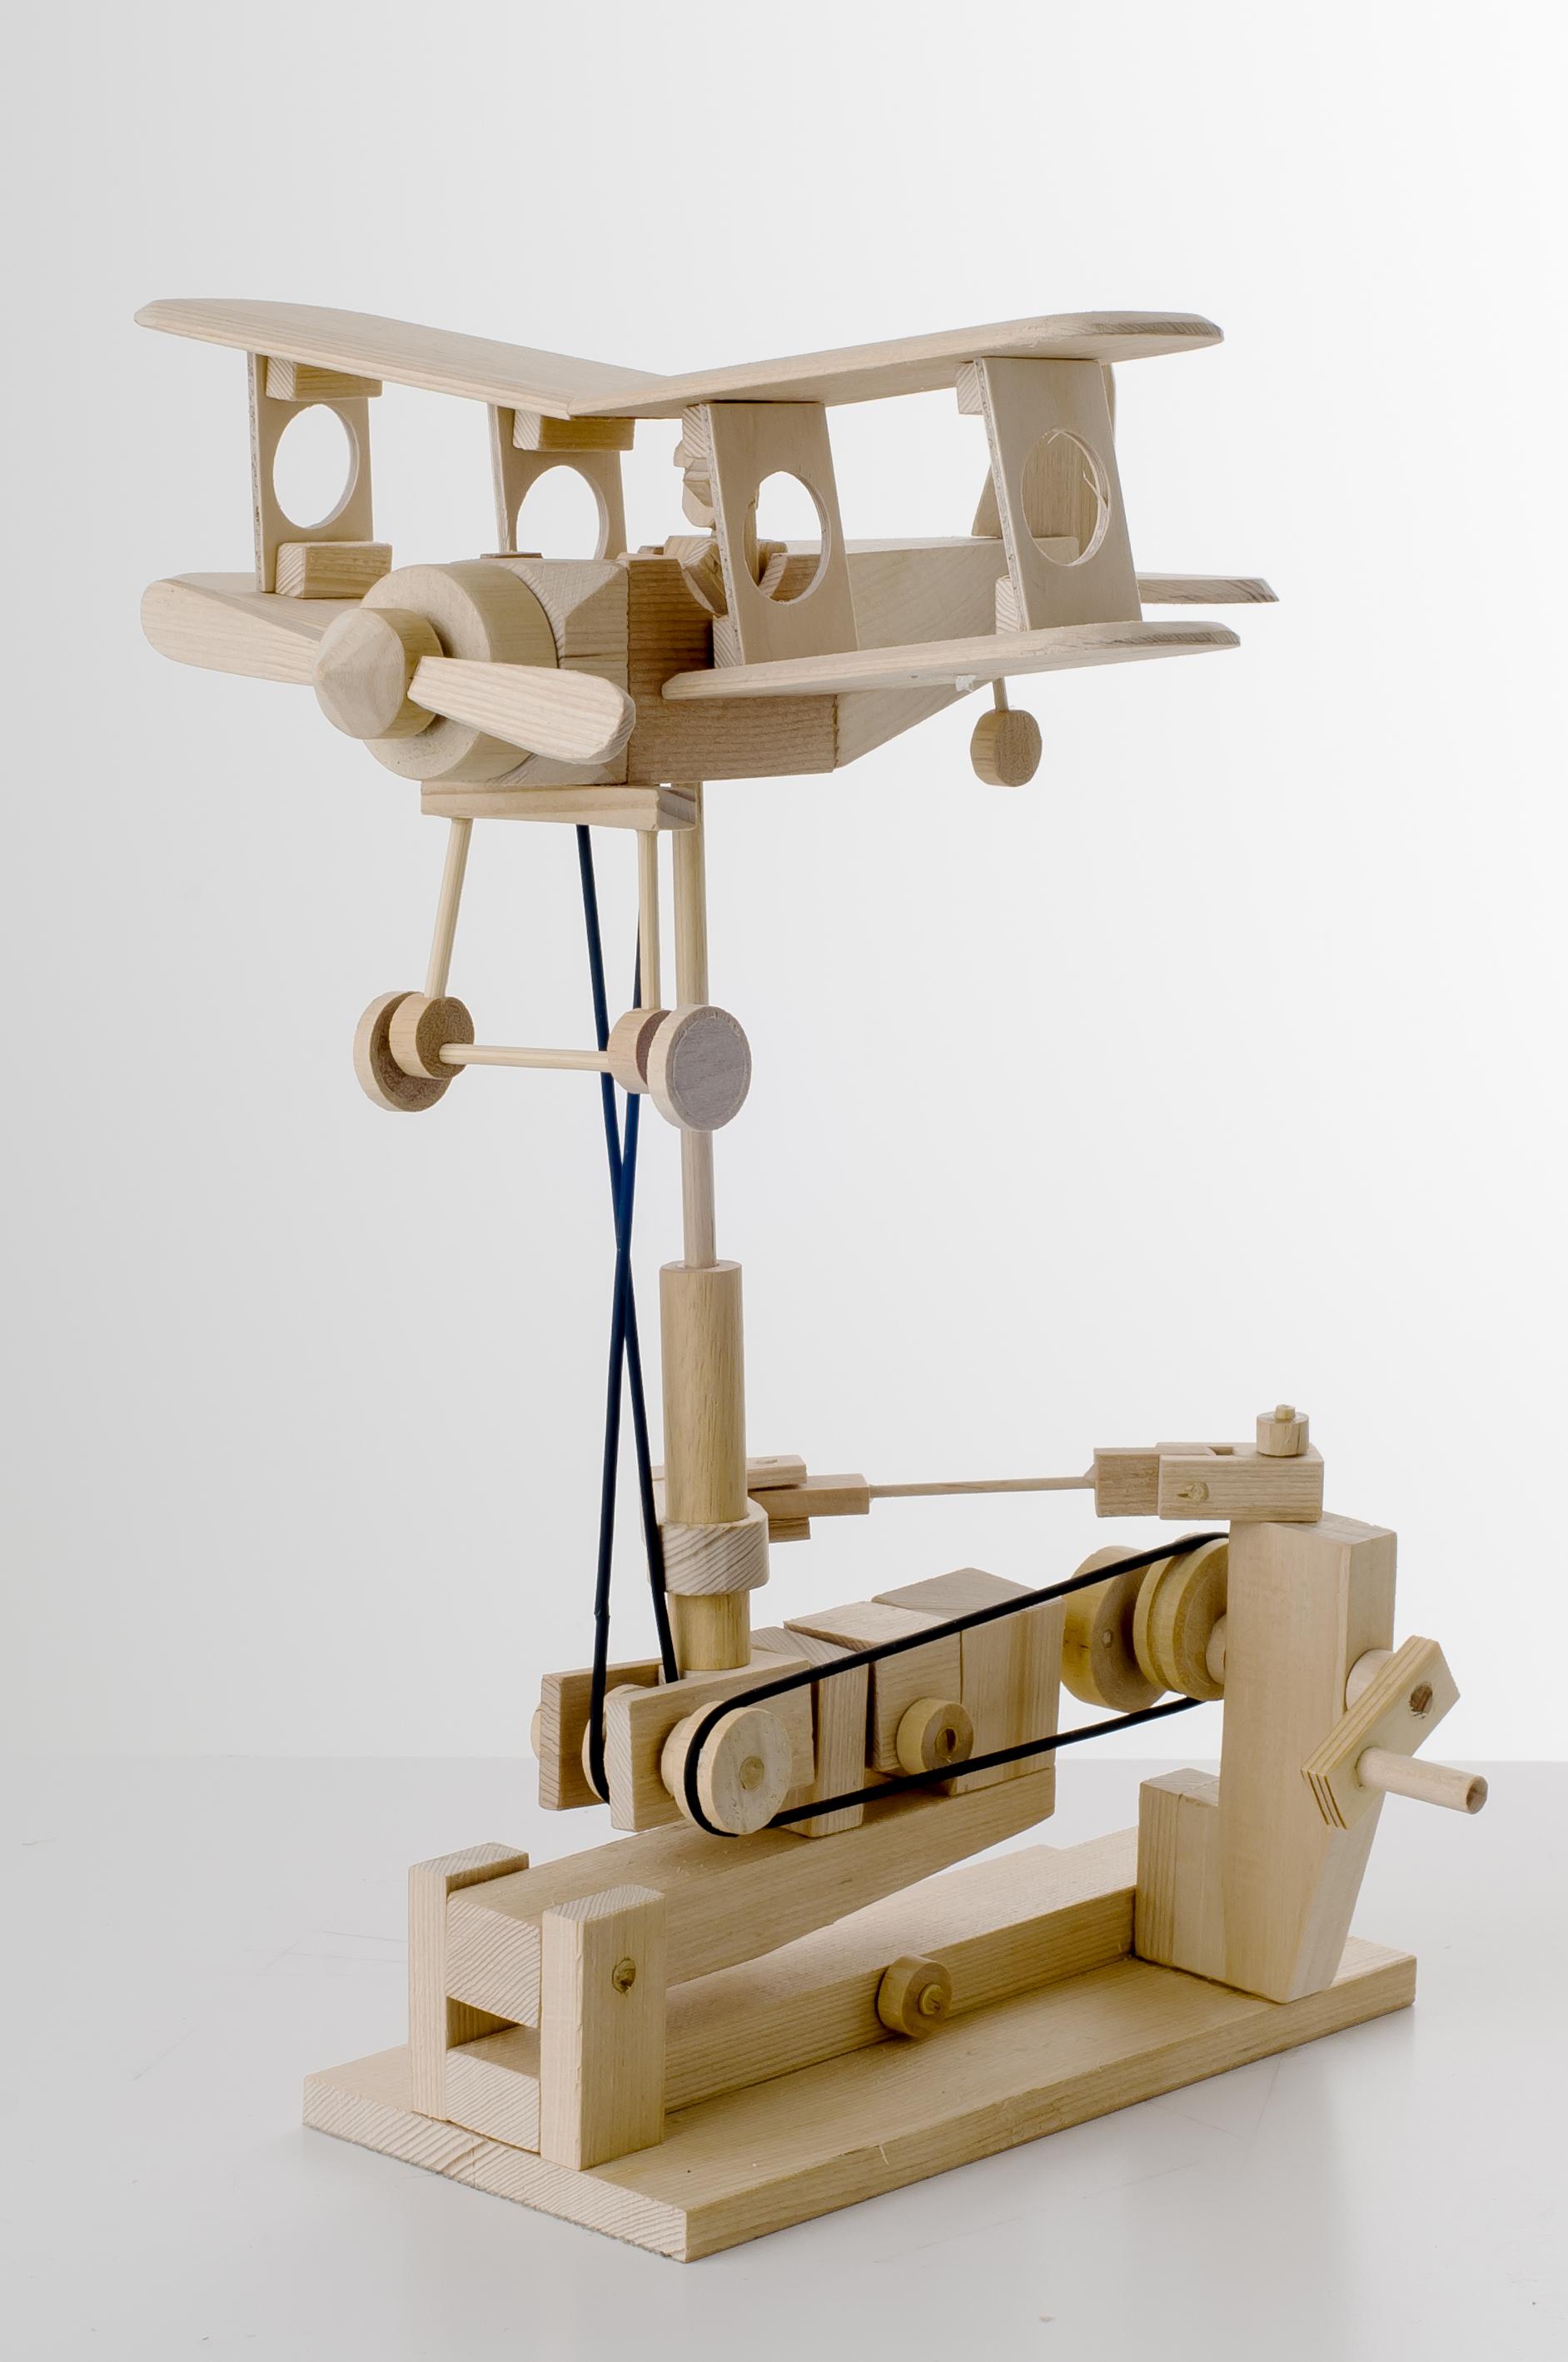 Bi-plane Wooden Automata Kit-0